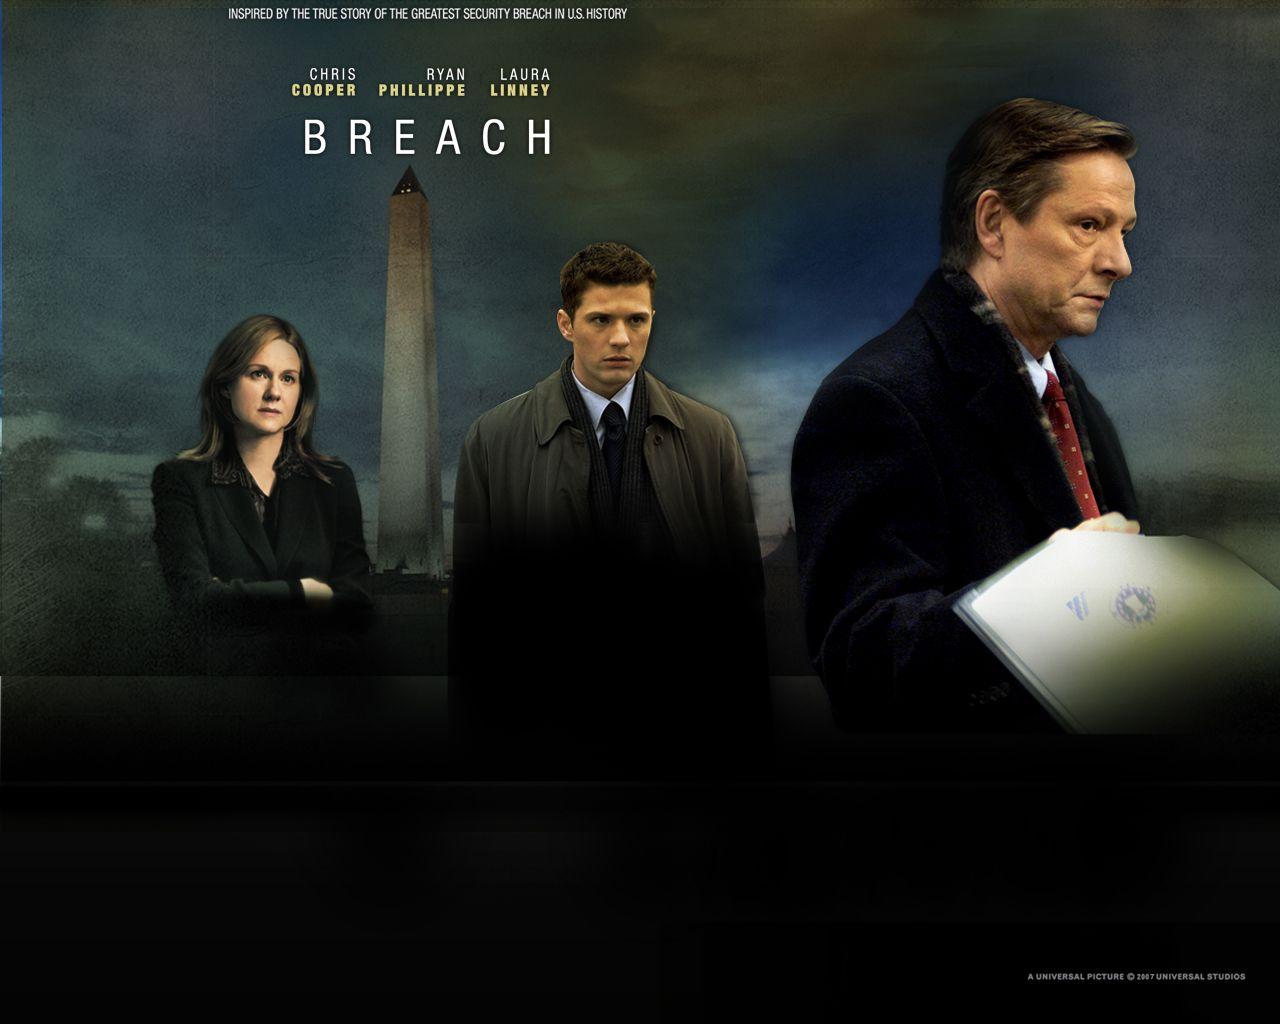 Watch Streaming Hd Breach Starring Chris Cooper Ryan Phillippe Dennis Haysbert Laura Linney Based On The True Story Fbi Upstart Eric O Neill Enters Into A